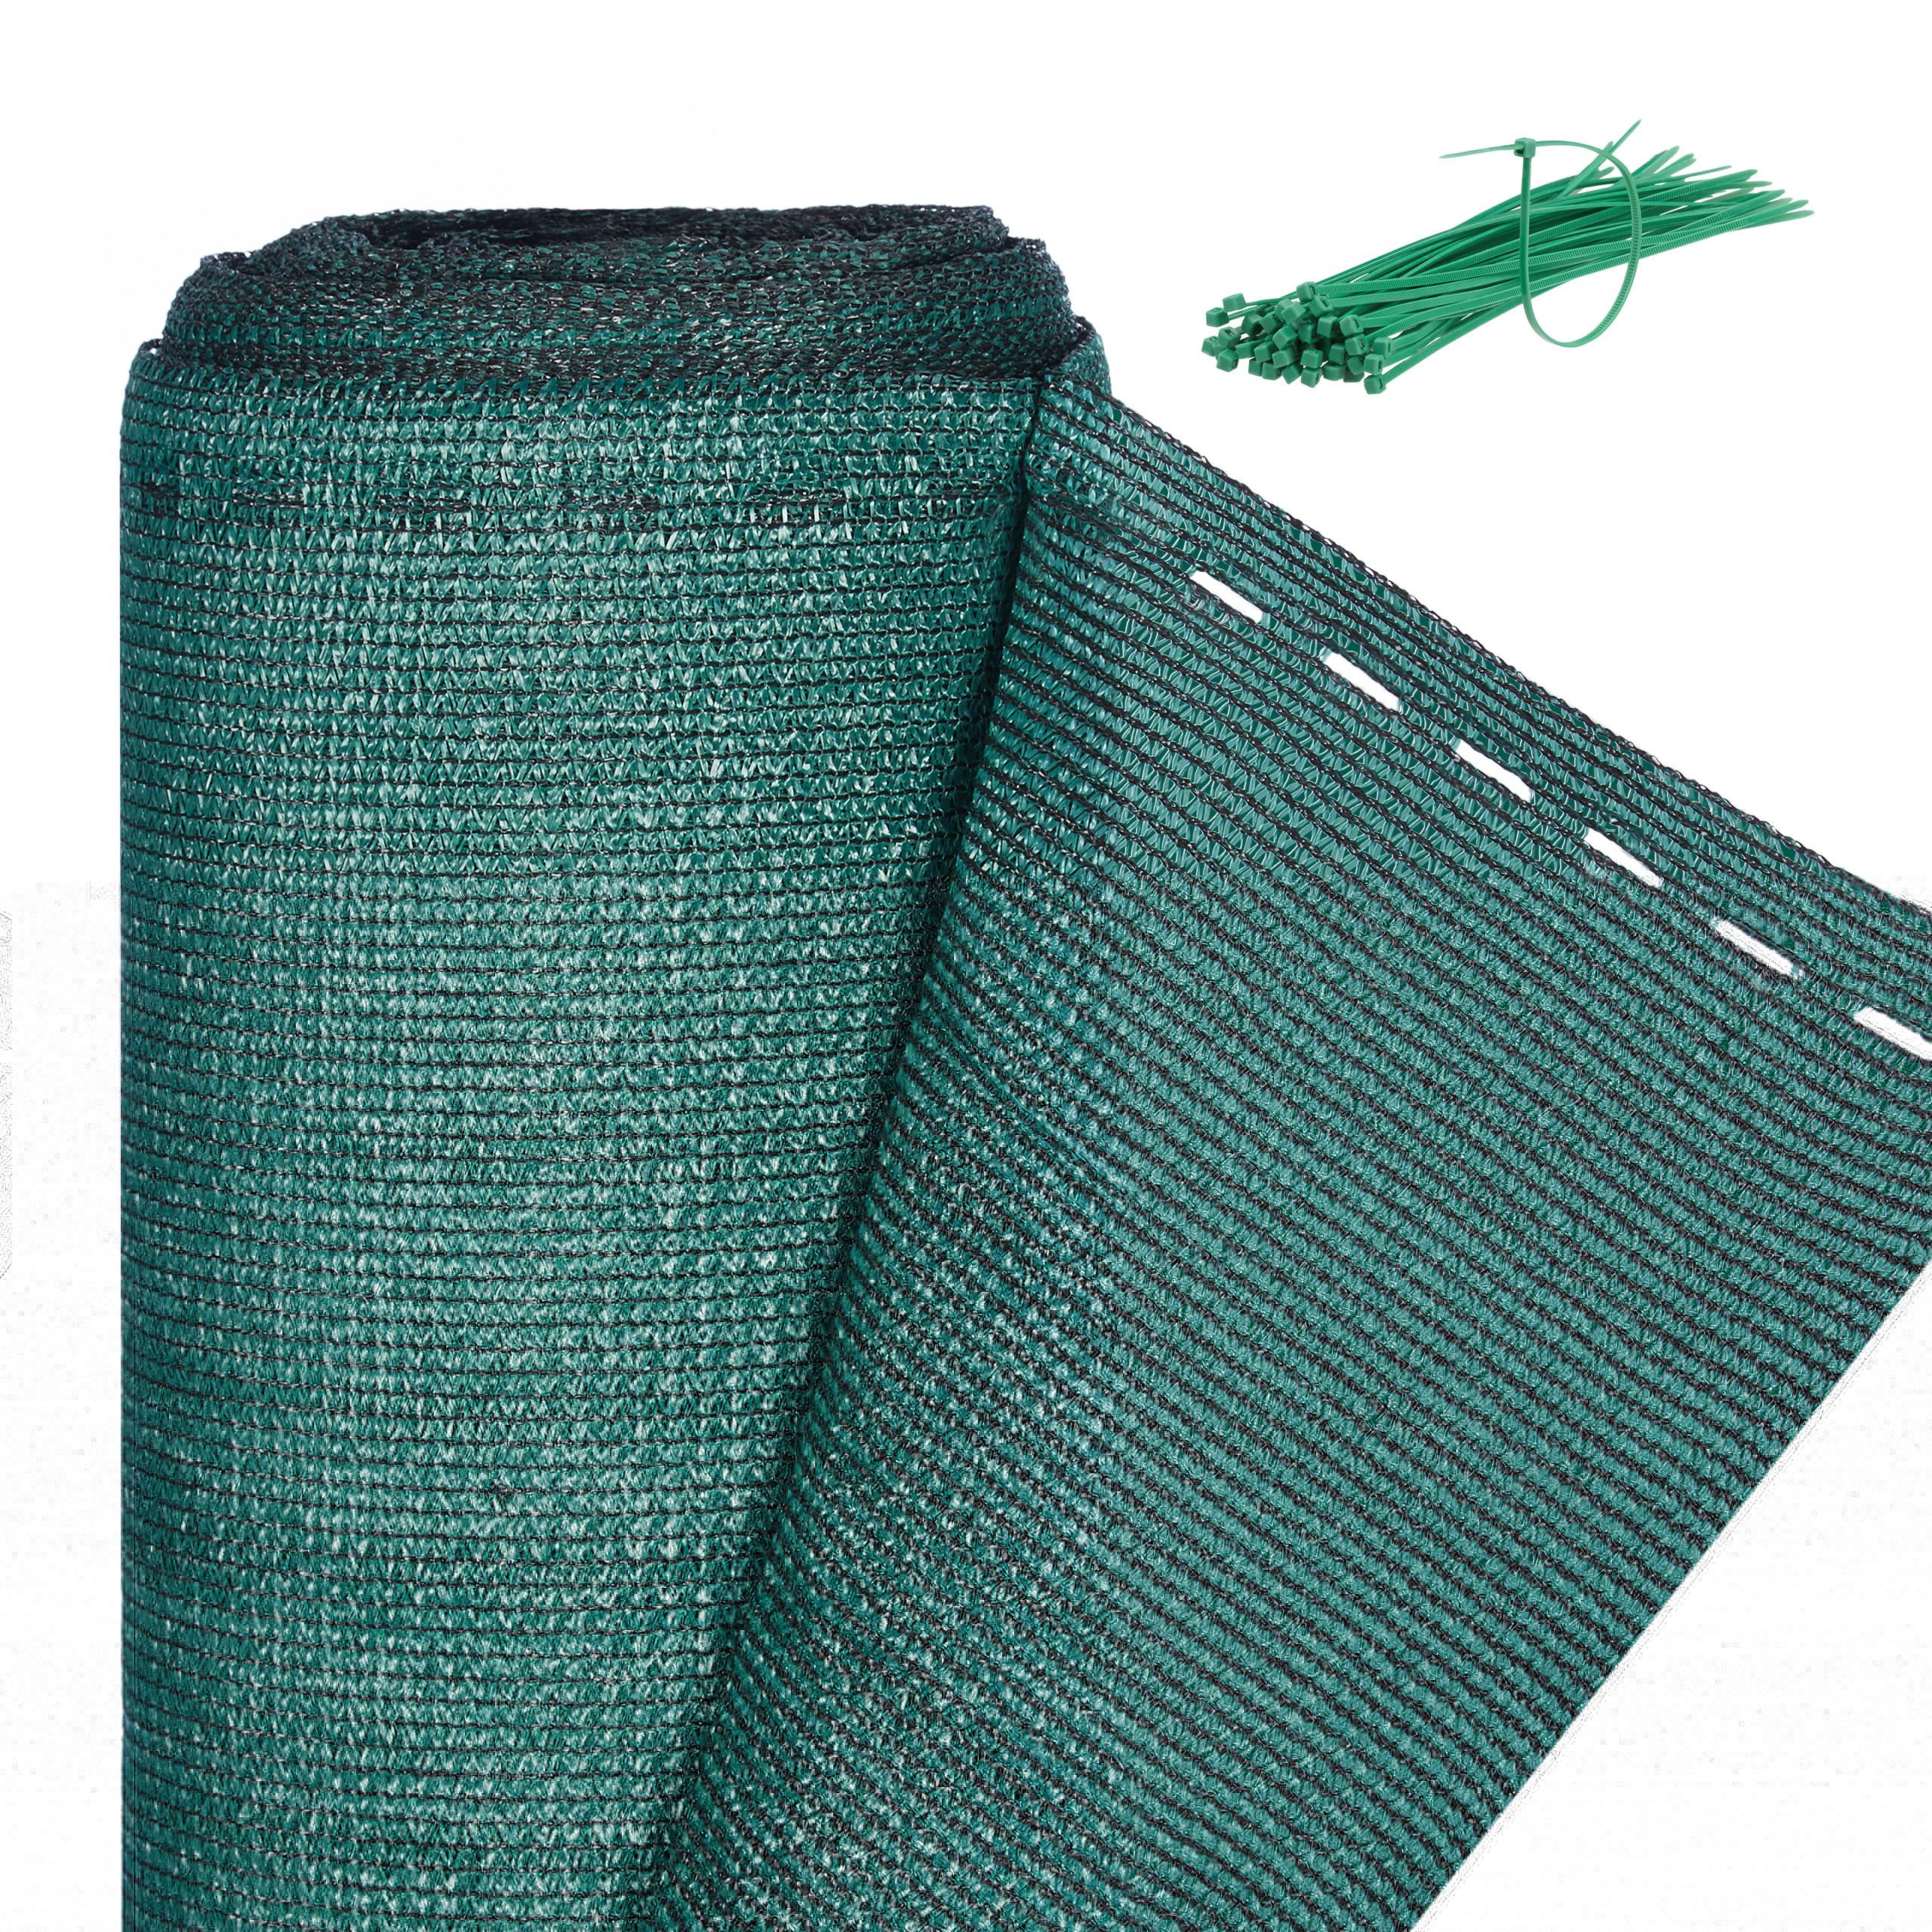 Brise Vert Hauteur 1 2 M Pare Vue Jardin Zaunsichtschutz Filet D